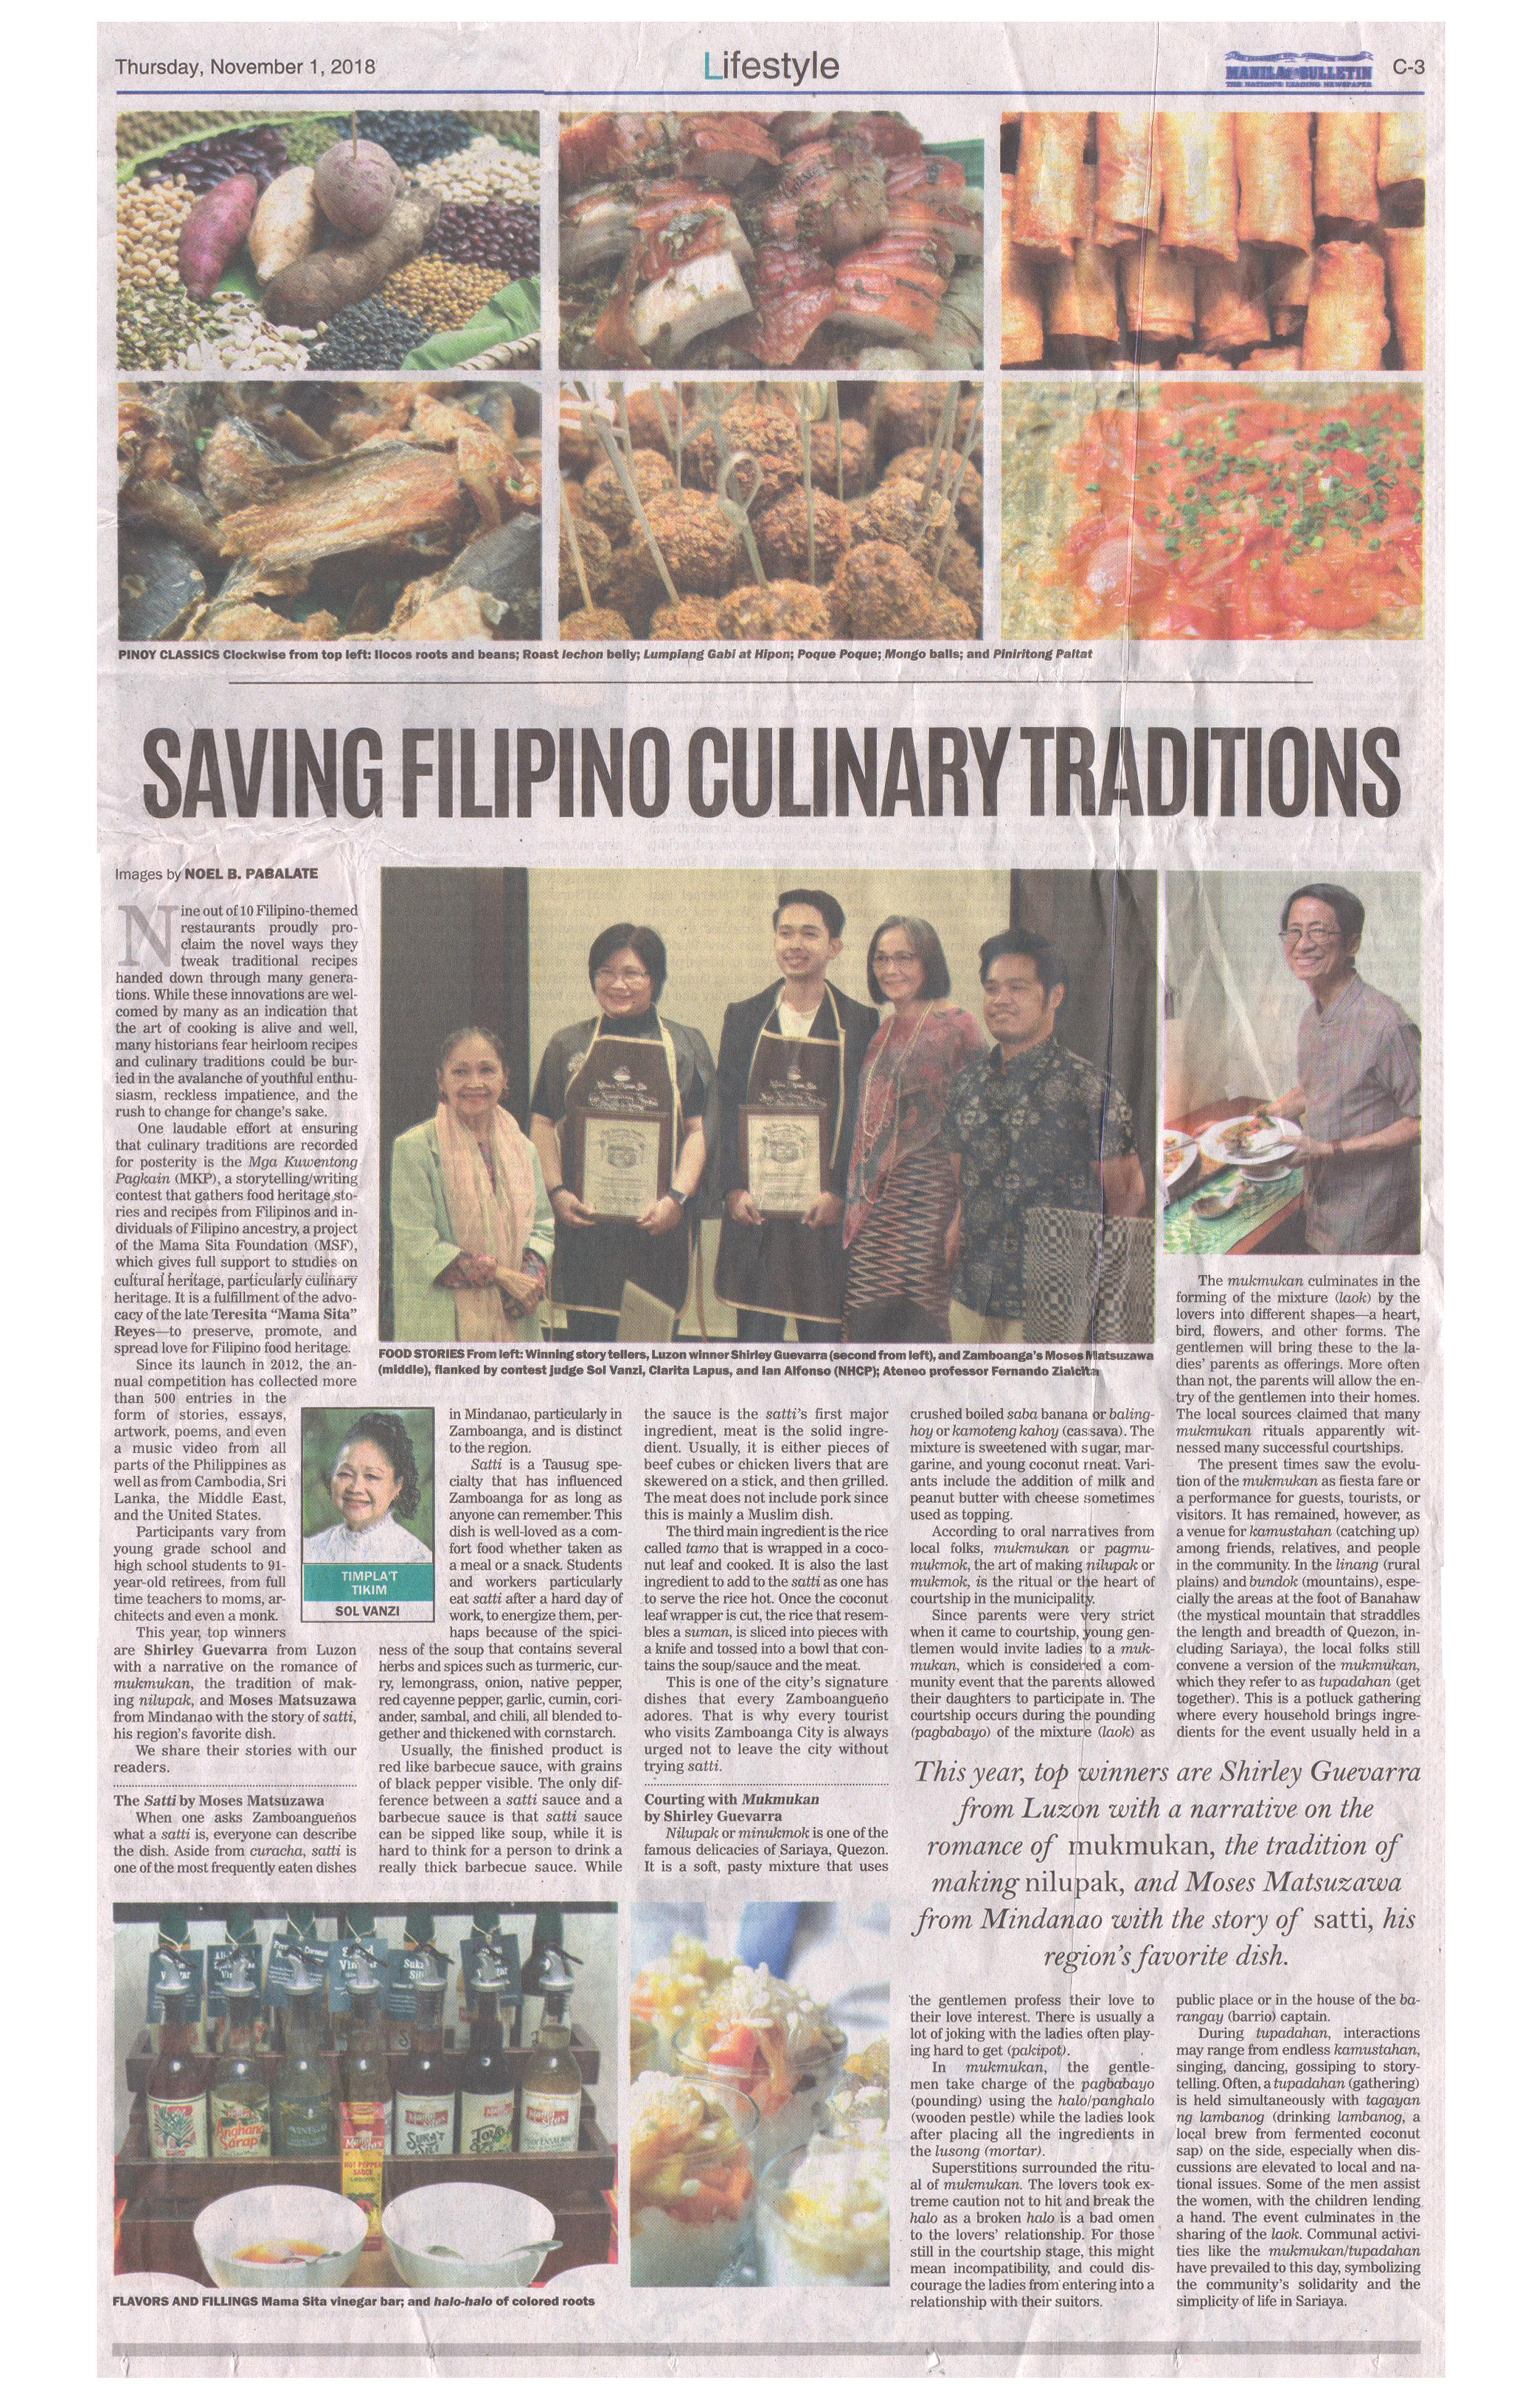 2018-11-01 - Manila Bulletin - Saving Filipino Culinary Traditions.jpg